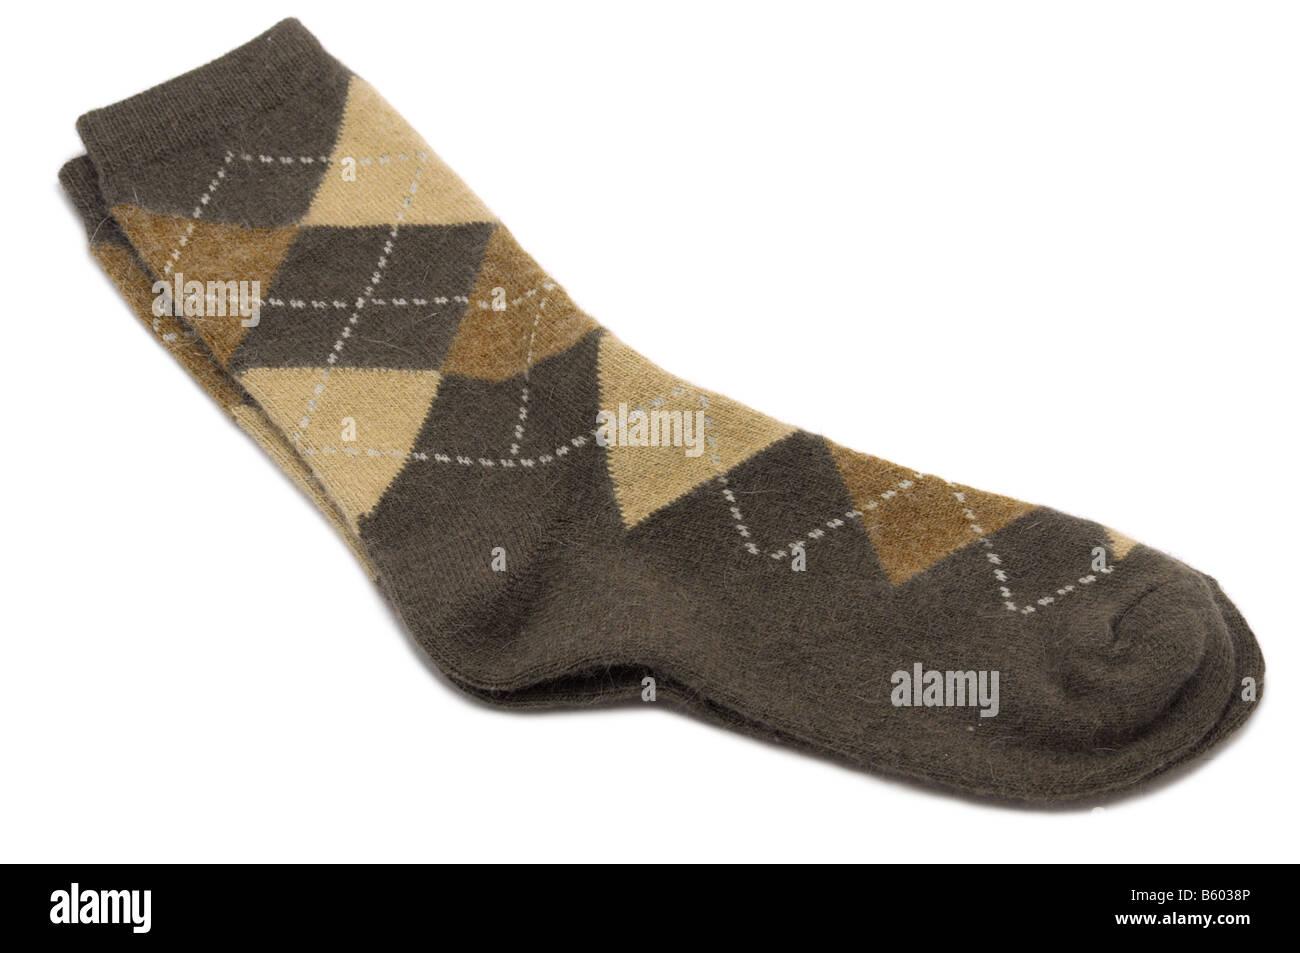 Pair of Socks - Stock Image